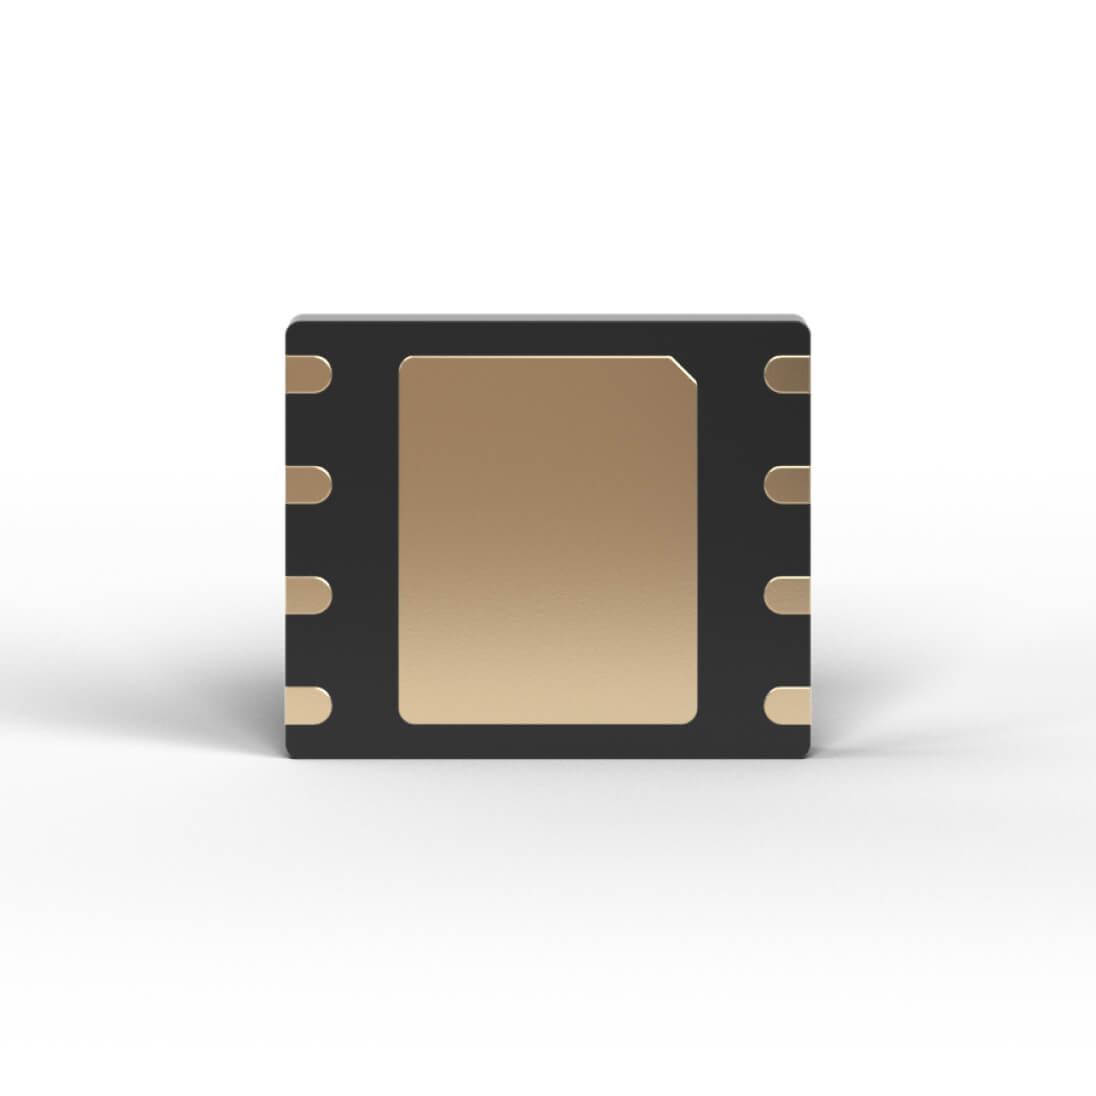 Soracom Embedded SIM eSIM